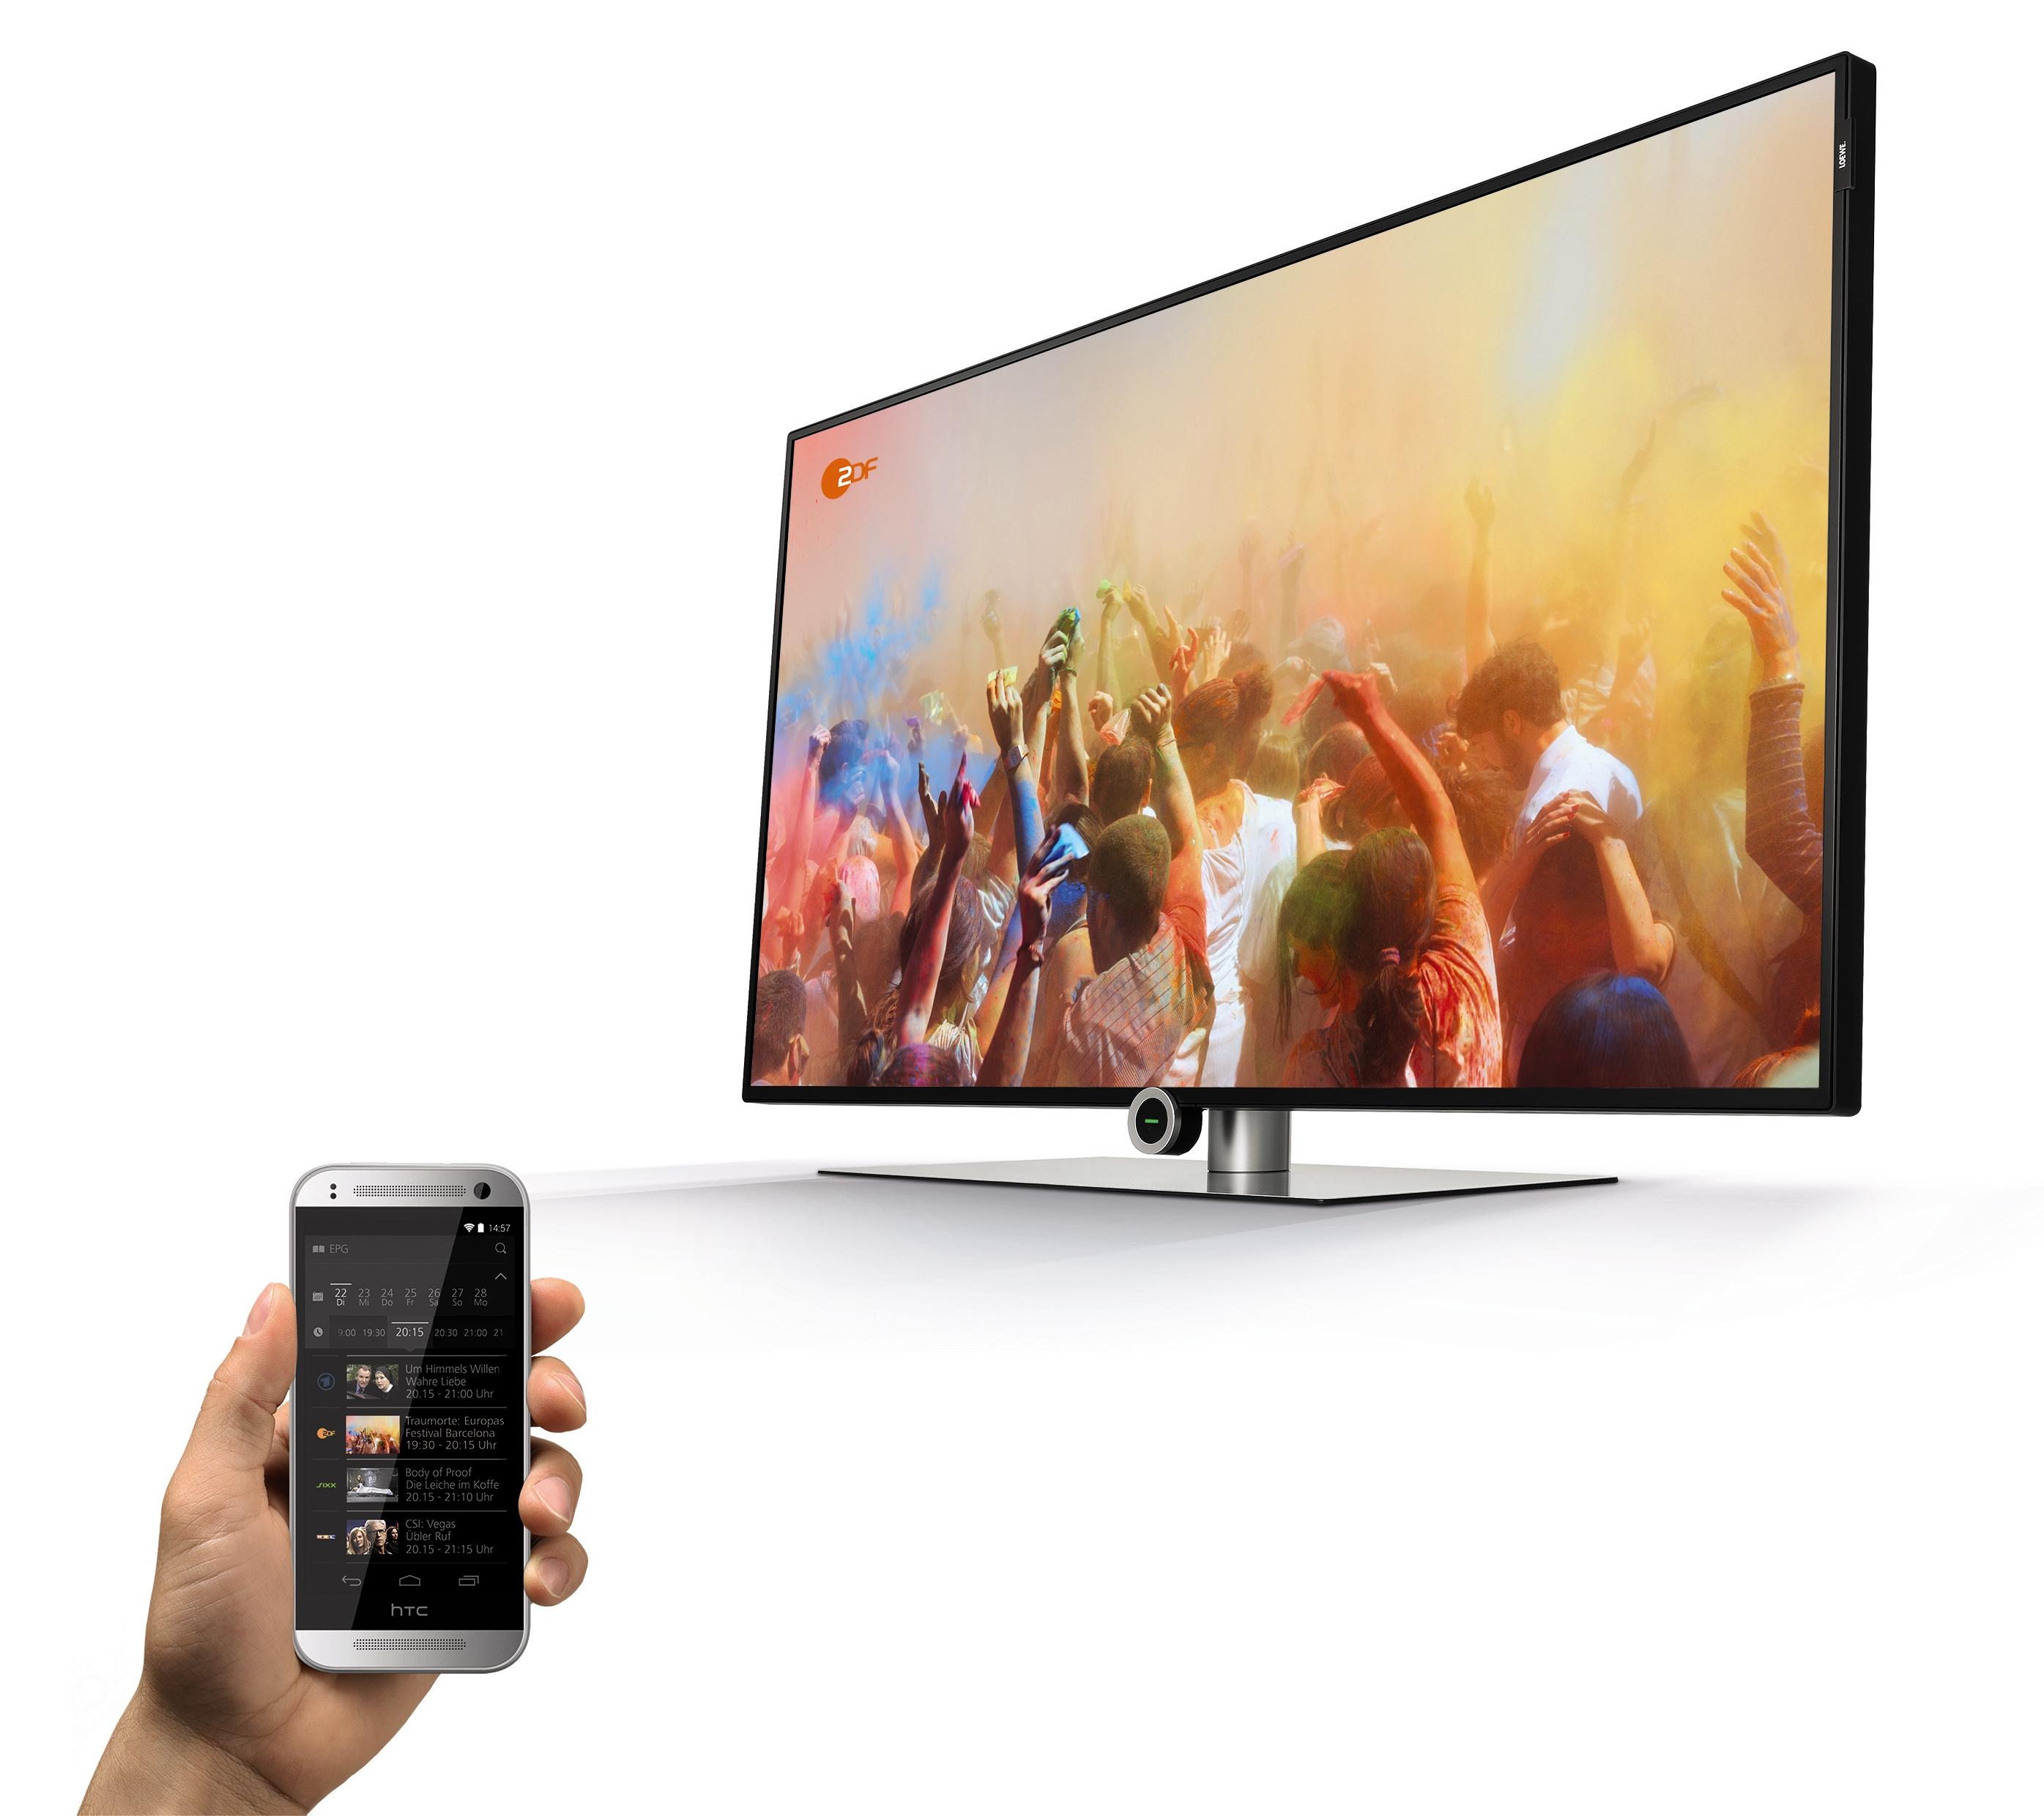 Partager facilement vos contenus multimédia Loewe one 55 UHD controlsound